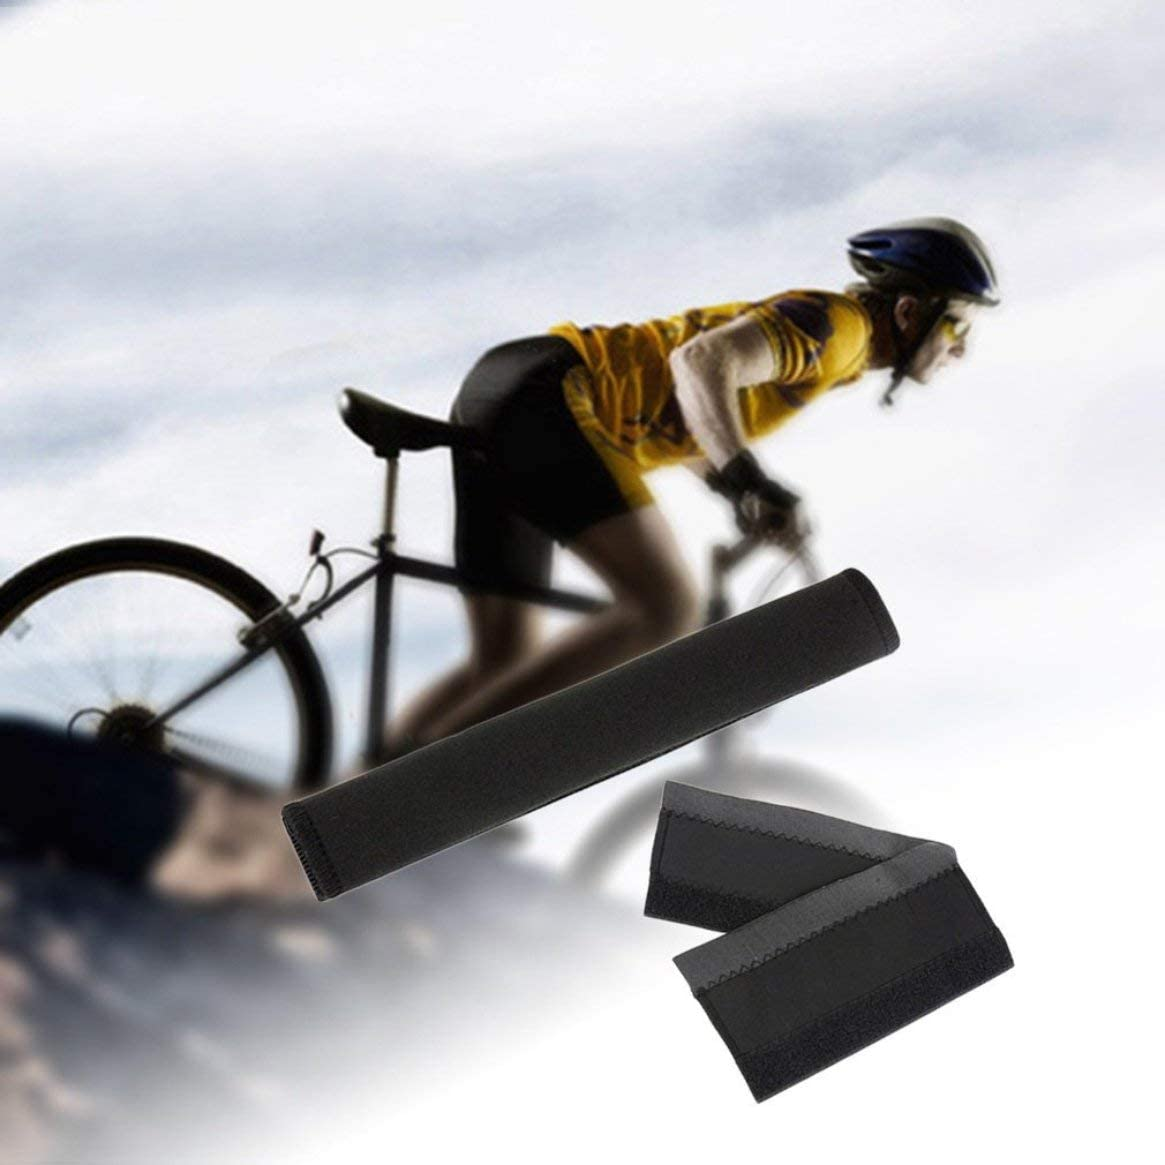 2pcs Neoprene Bike Bicycle Frame Protector Chain Stay Guard Cover Sleeve Pad Freeday-uk